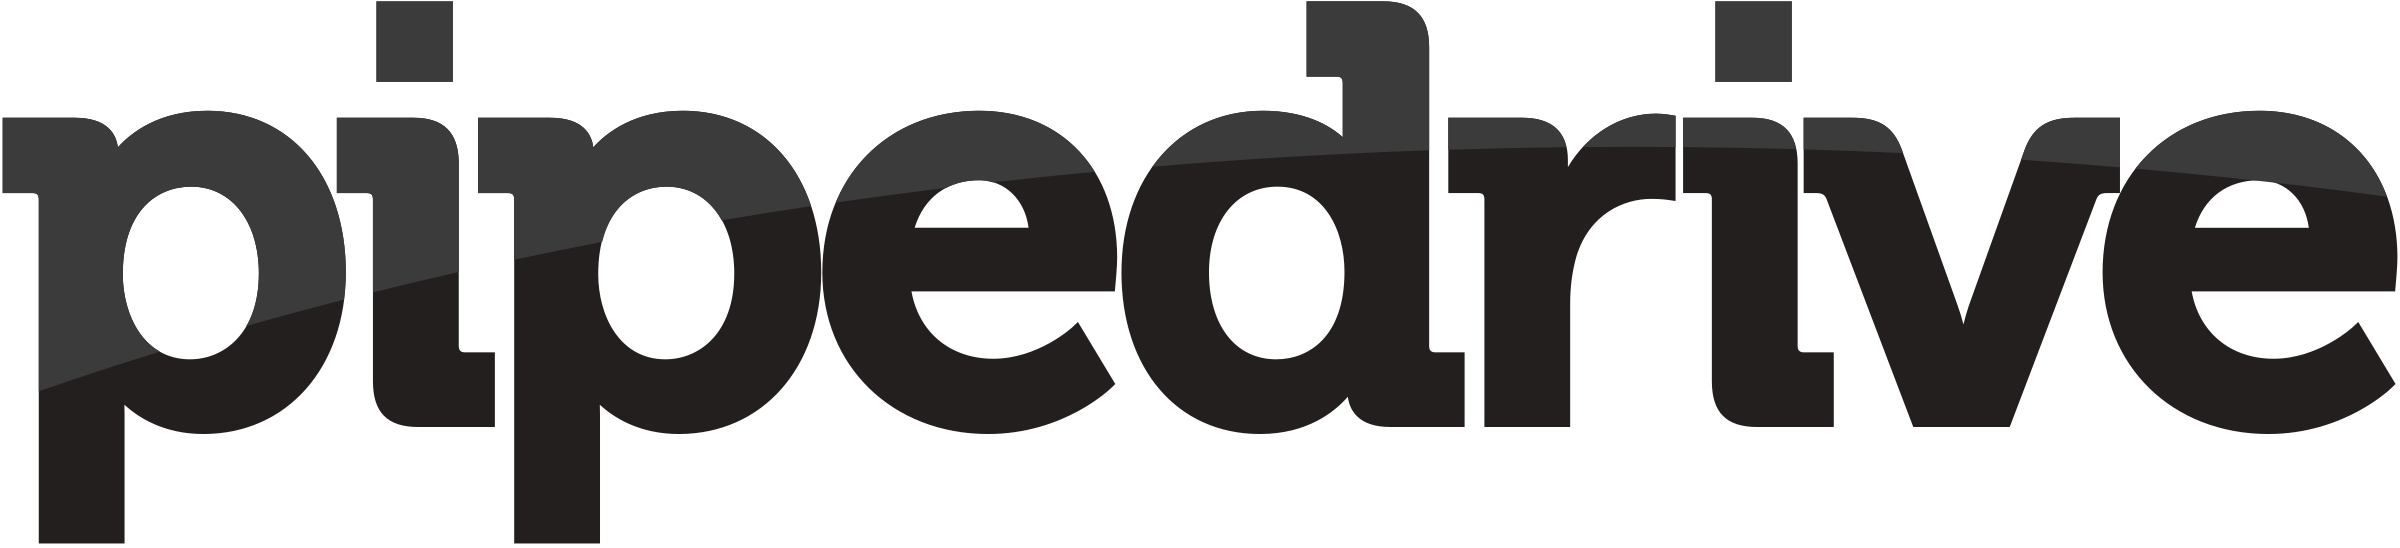 Pipedrive-logo-1